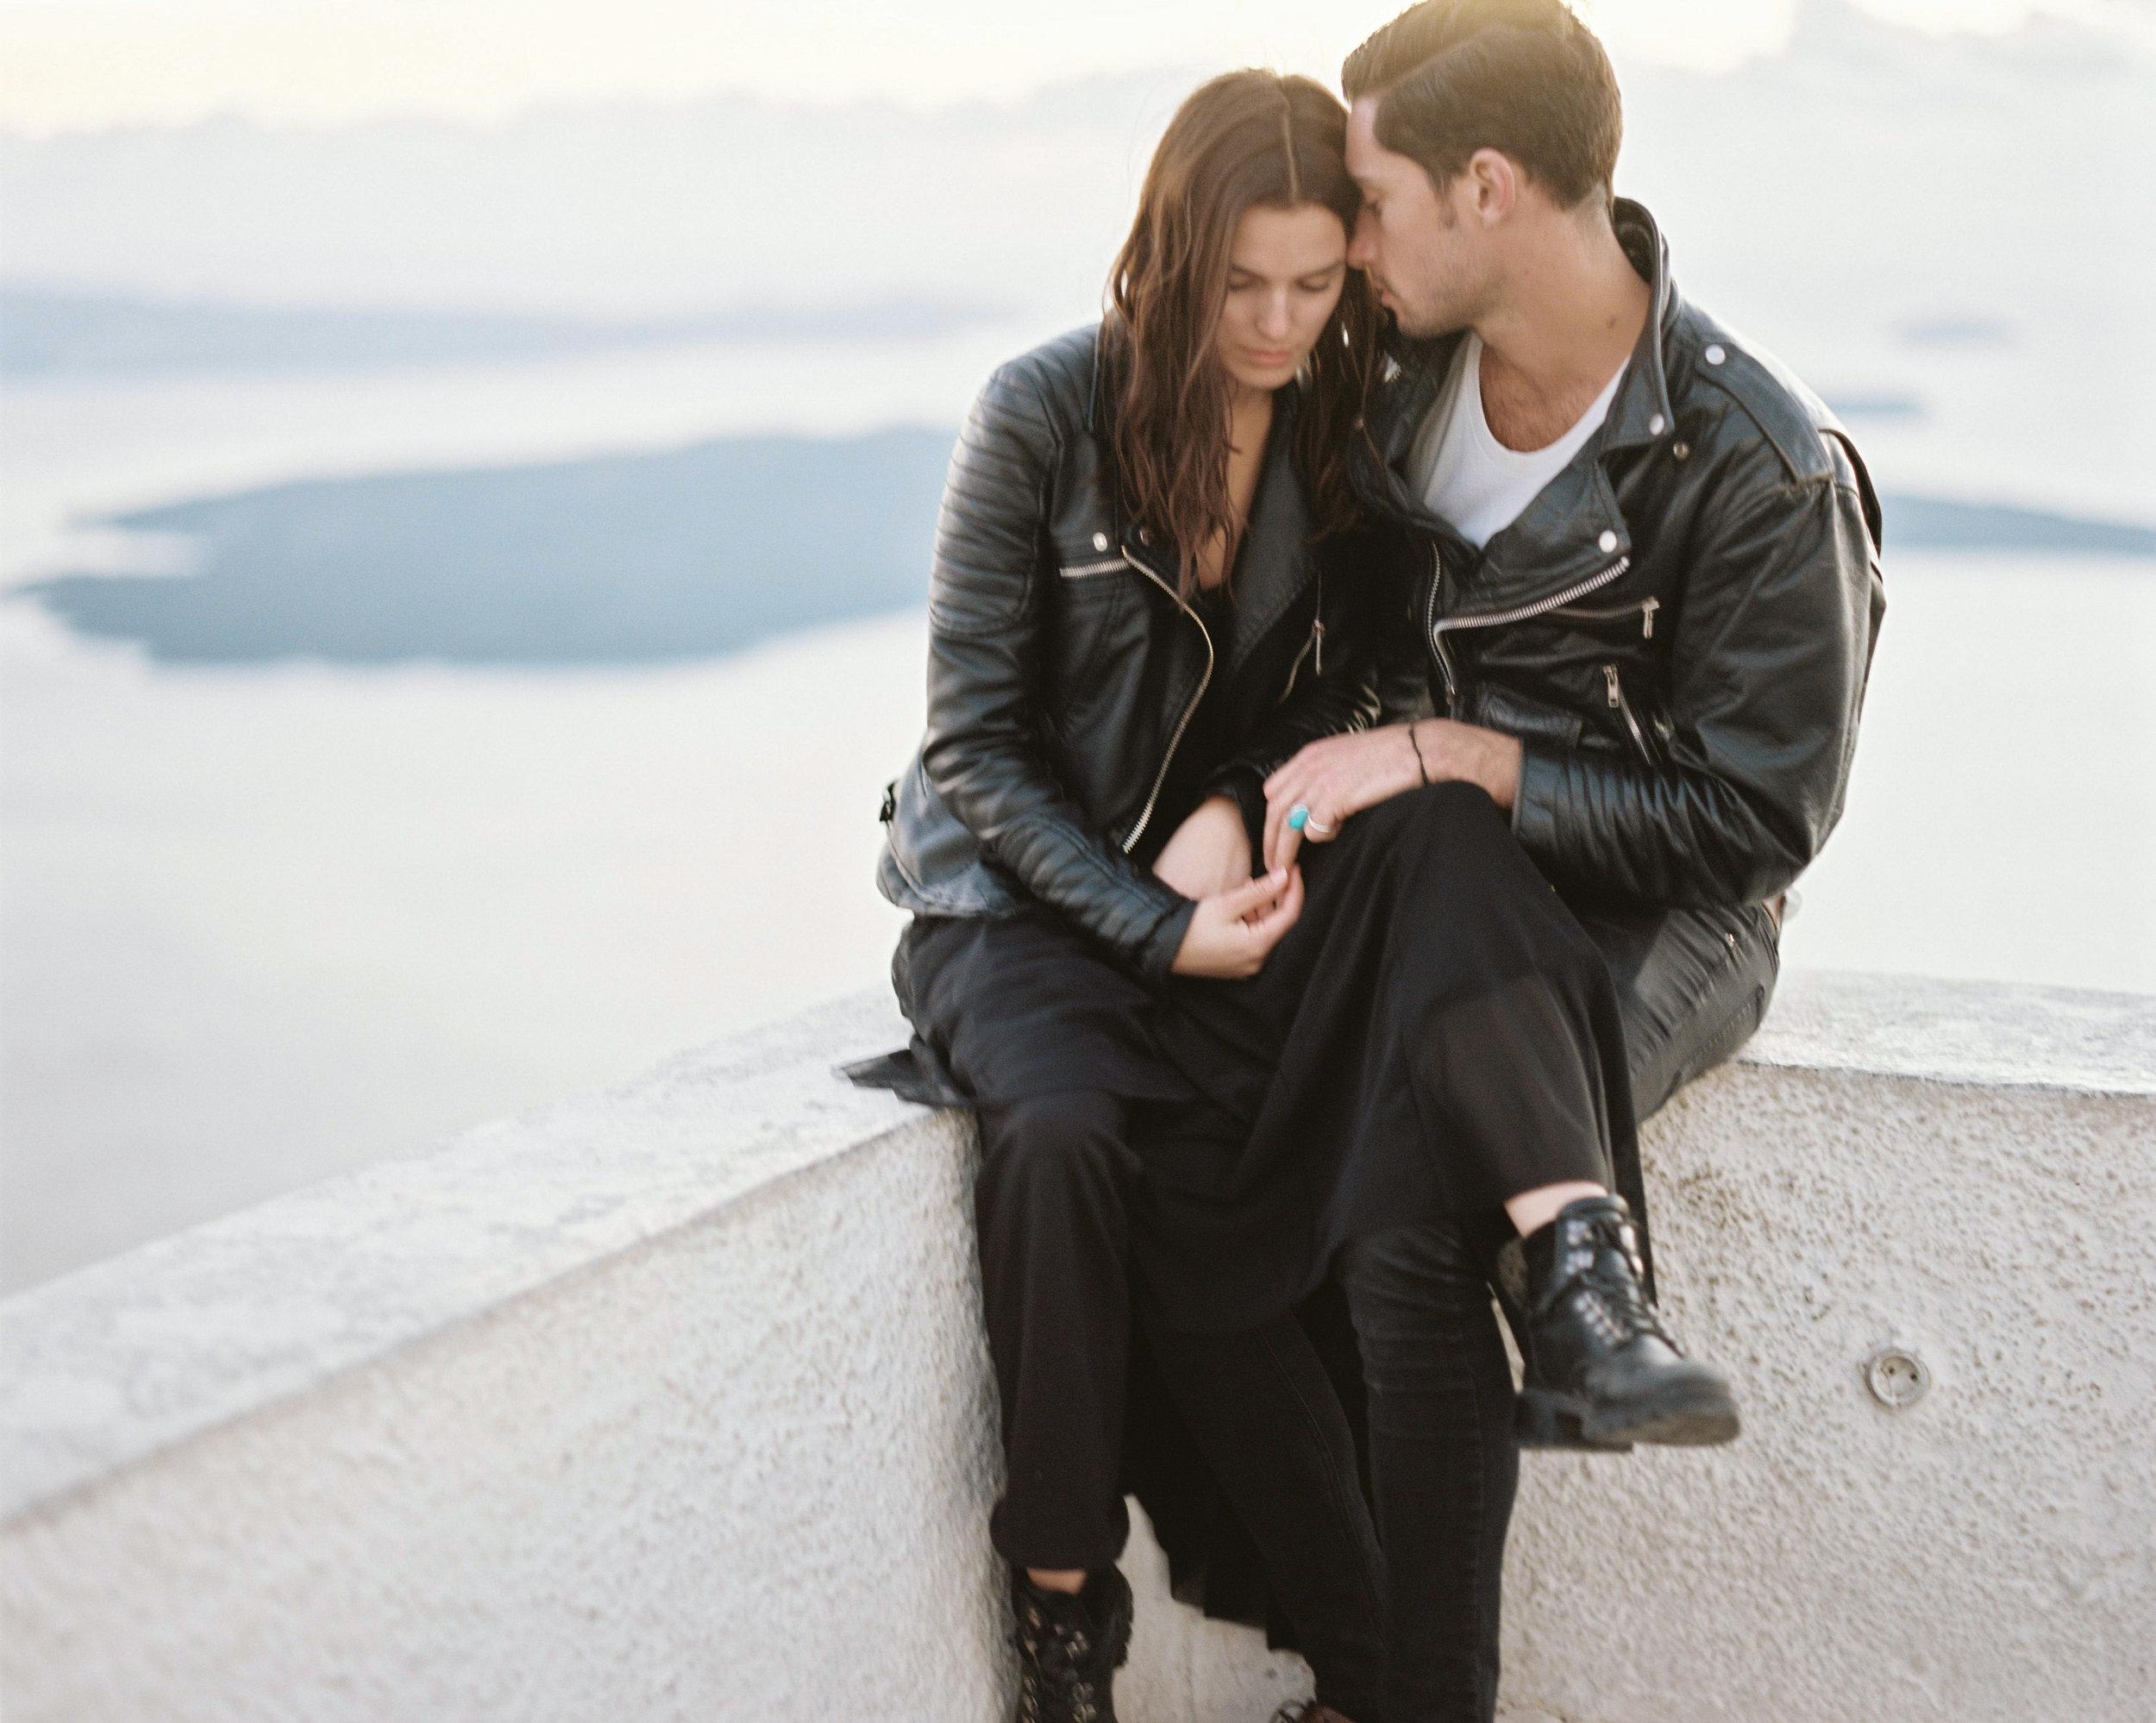 celinehamelin-photographe-couple-argentique-loversession-grece-santorin-argentique-filmphotography-greece23.jpg